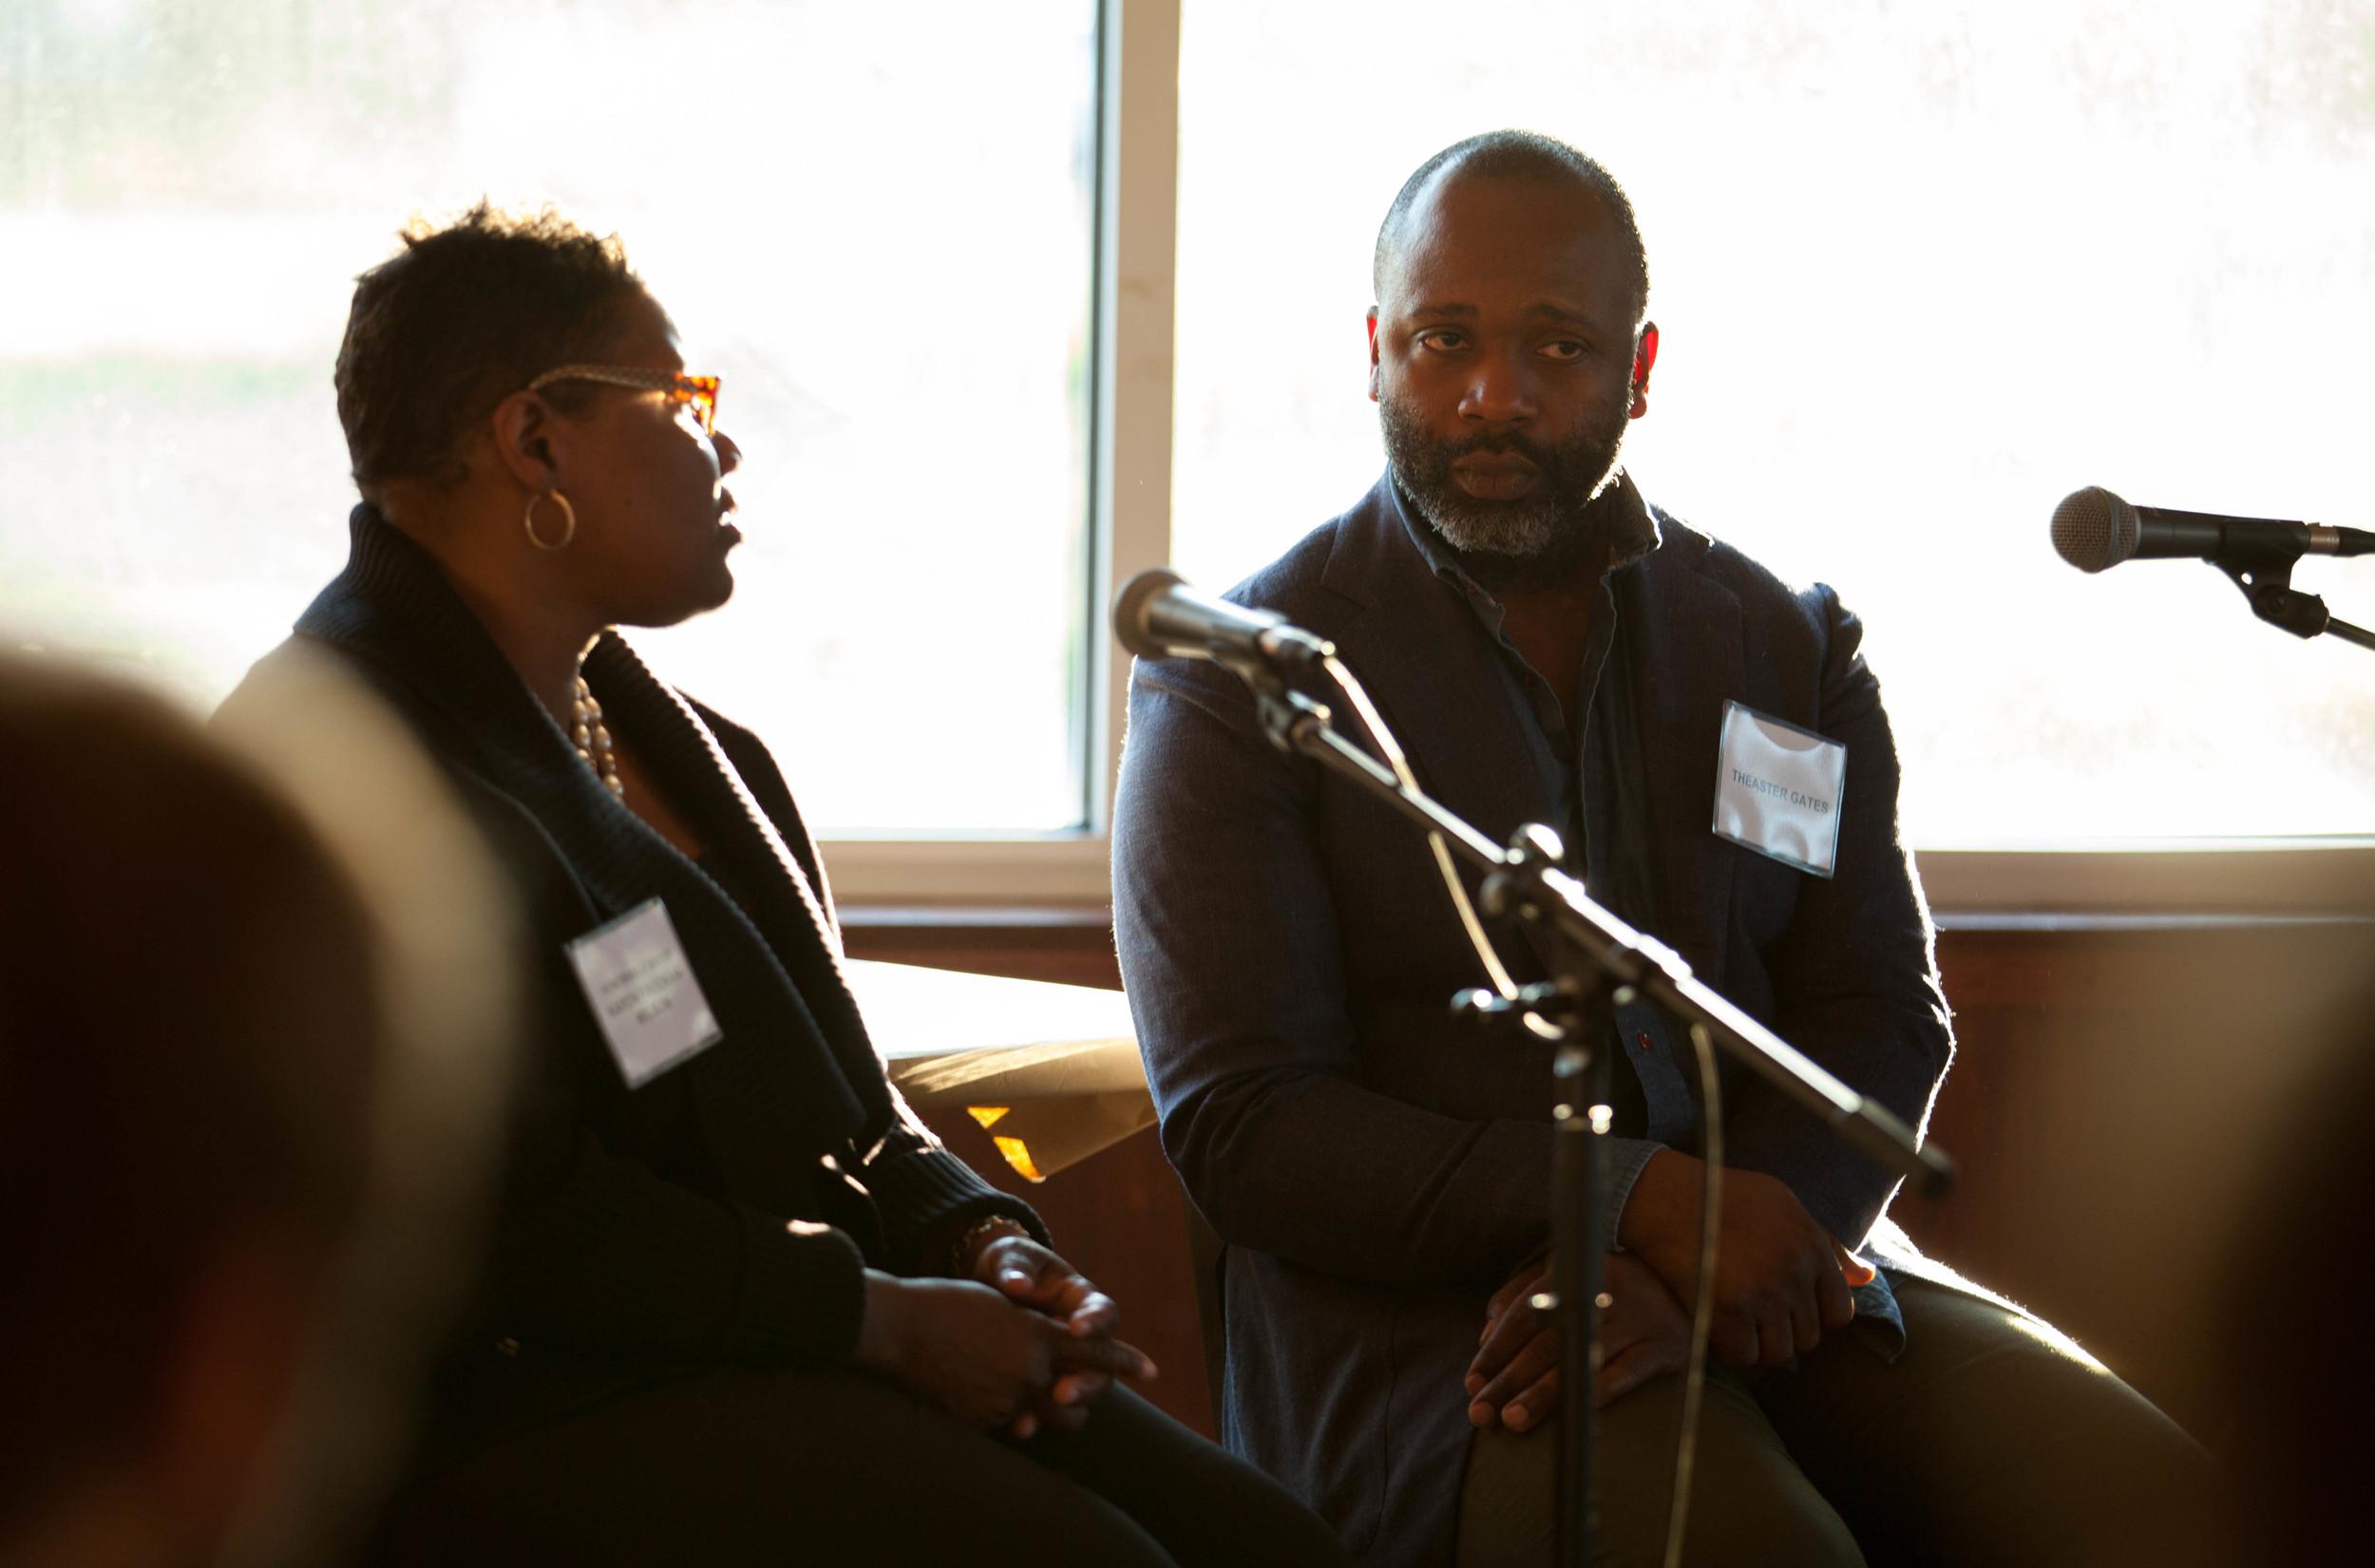 Mayor Karen Wilson-Freeman and Theaster Gates in conversation